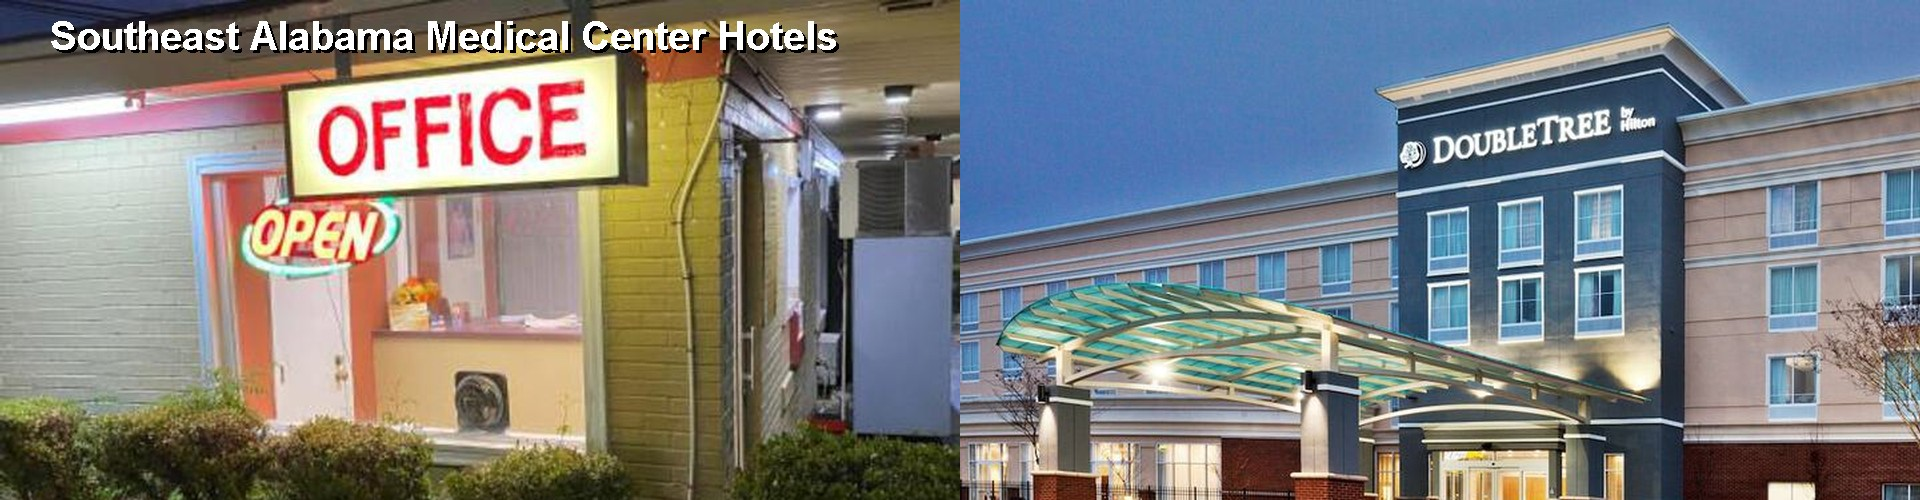 42 Hotels Near Southeast Alabama Medical Center In Dothan Al